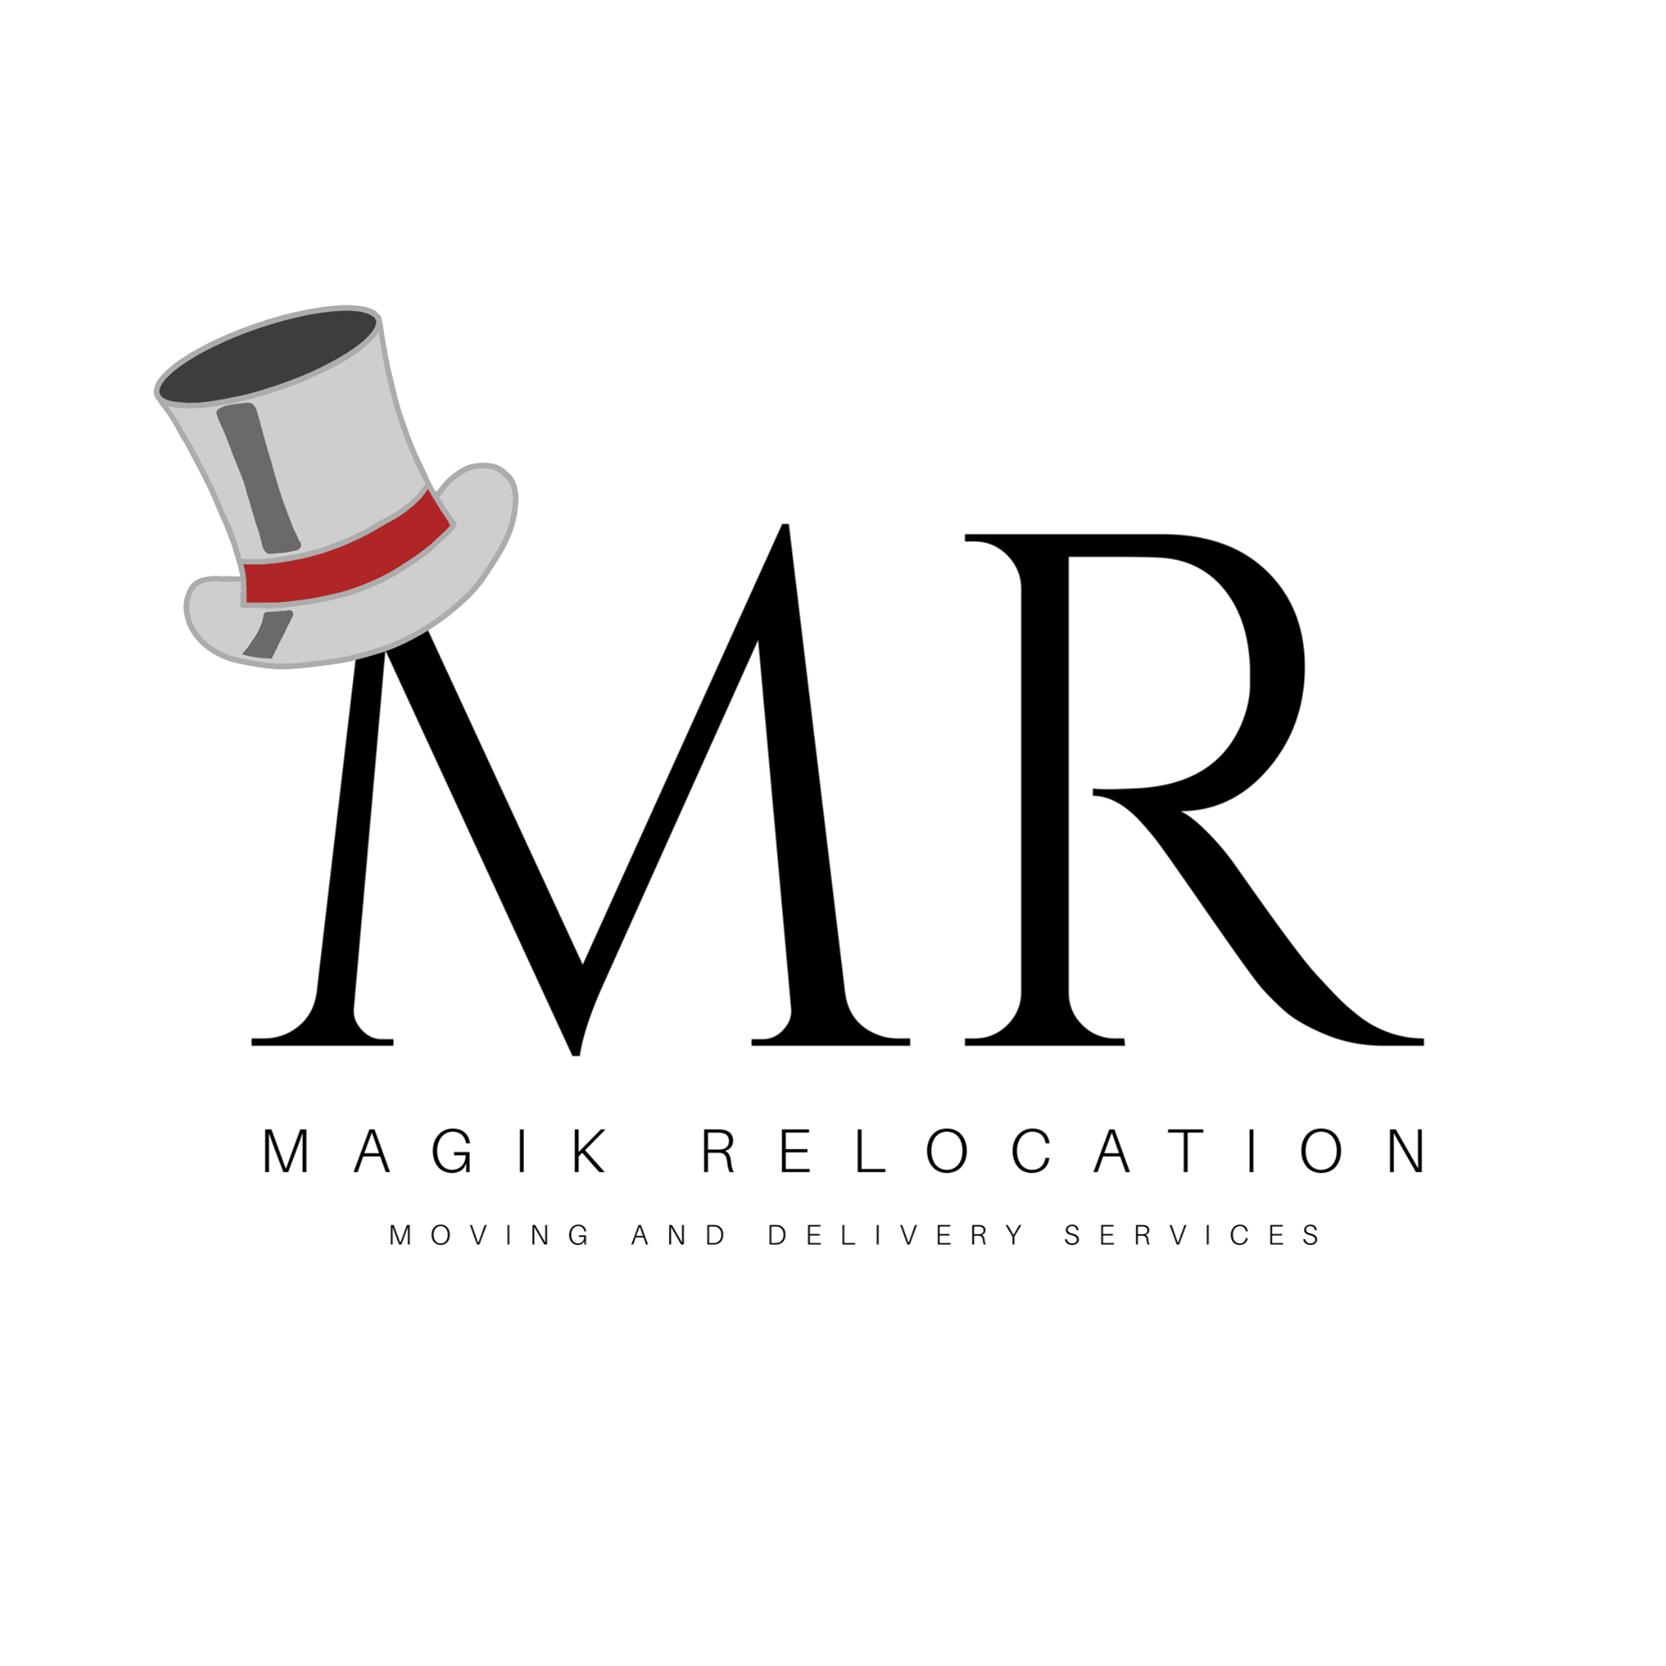 Magik Relocation